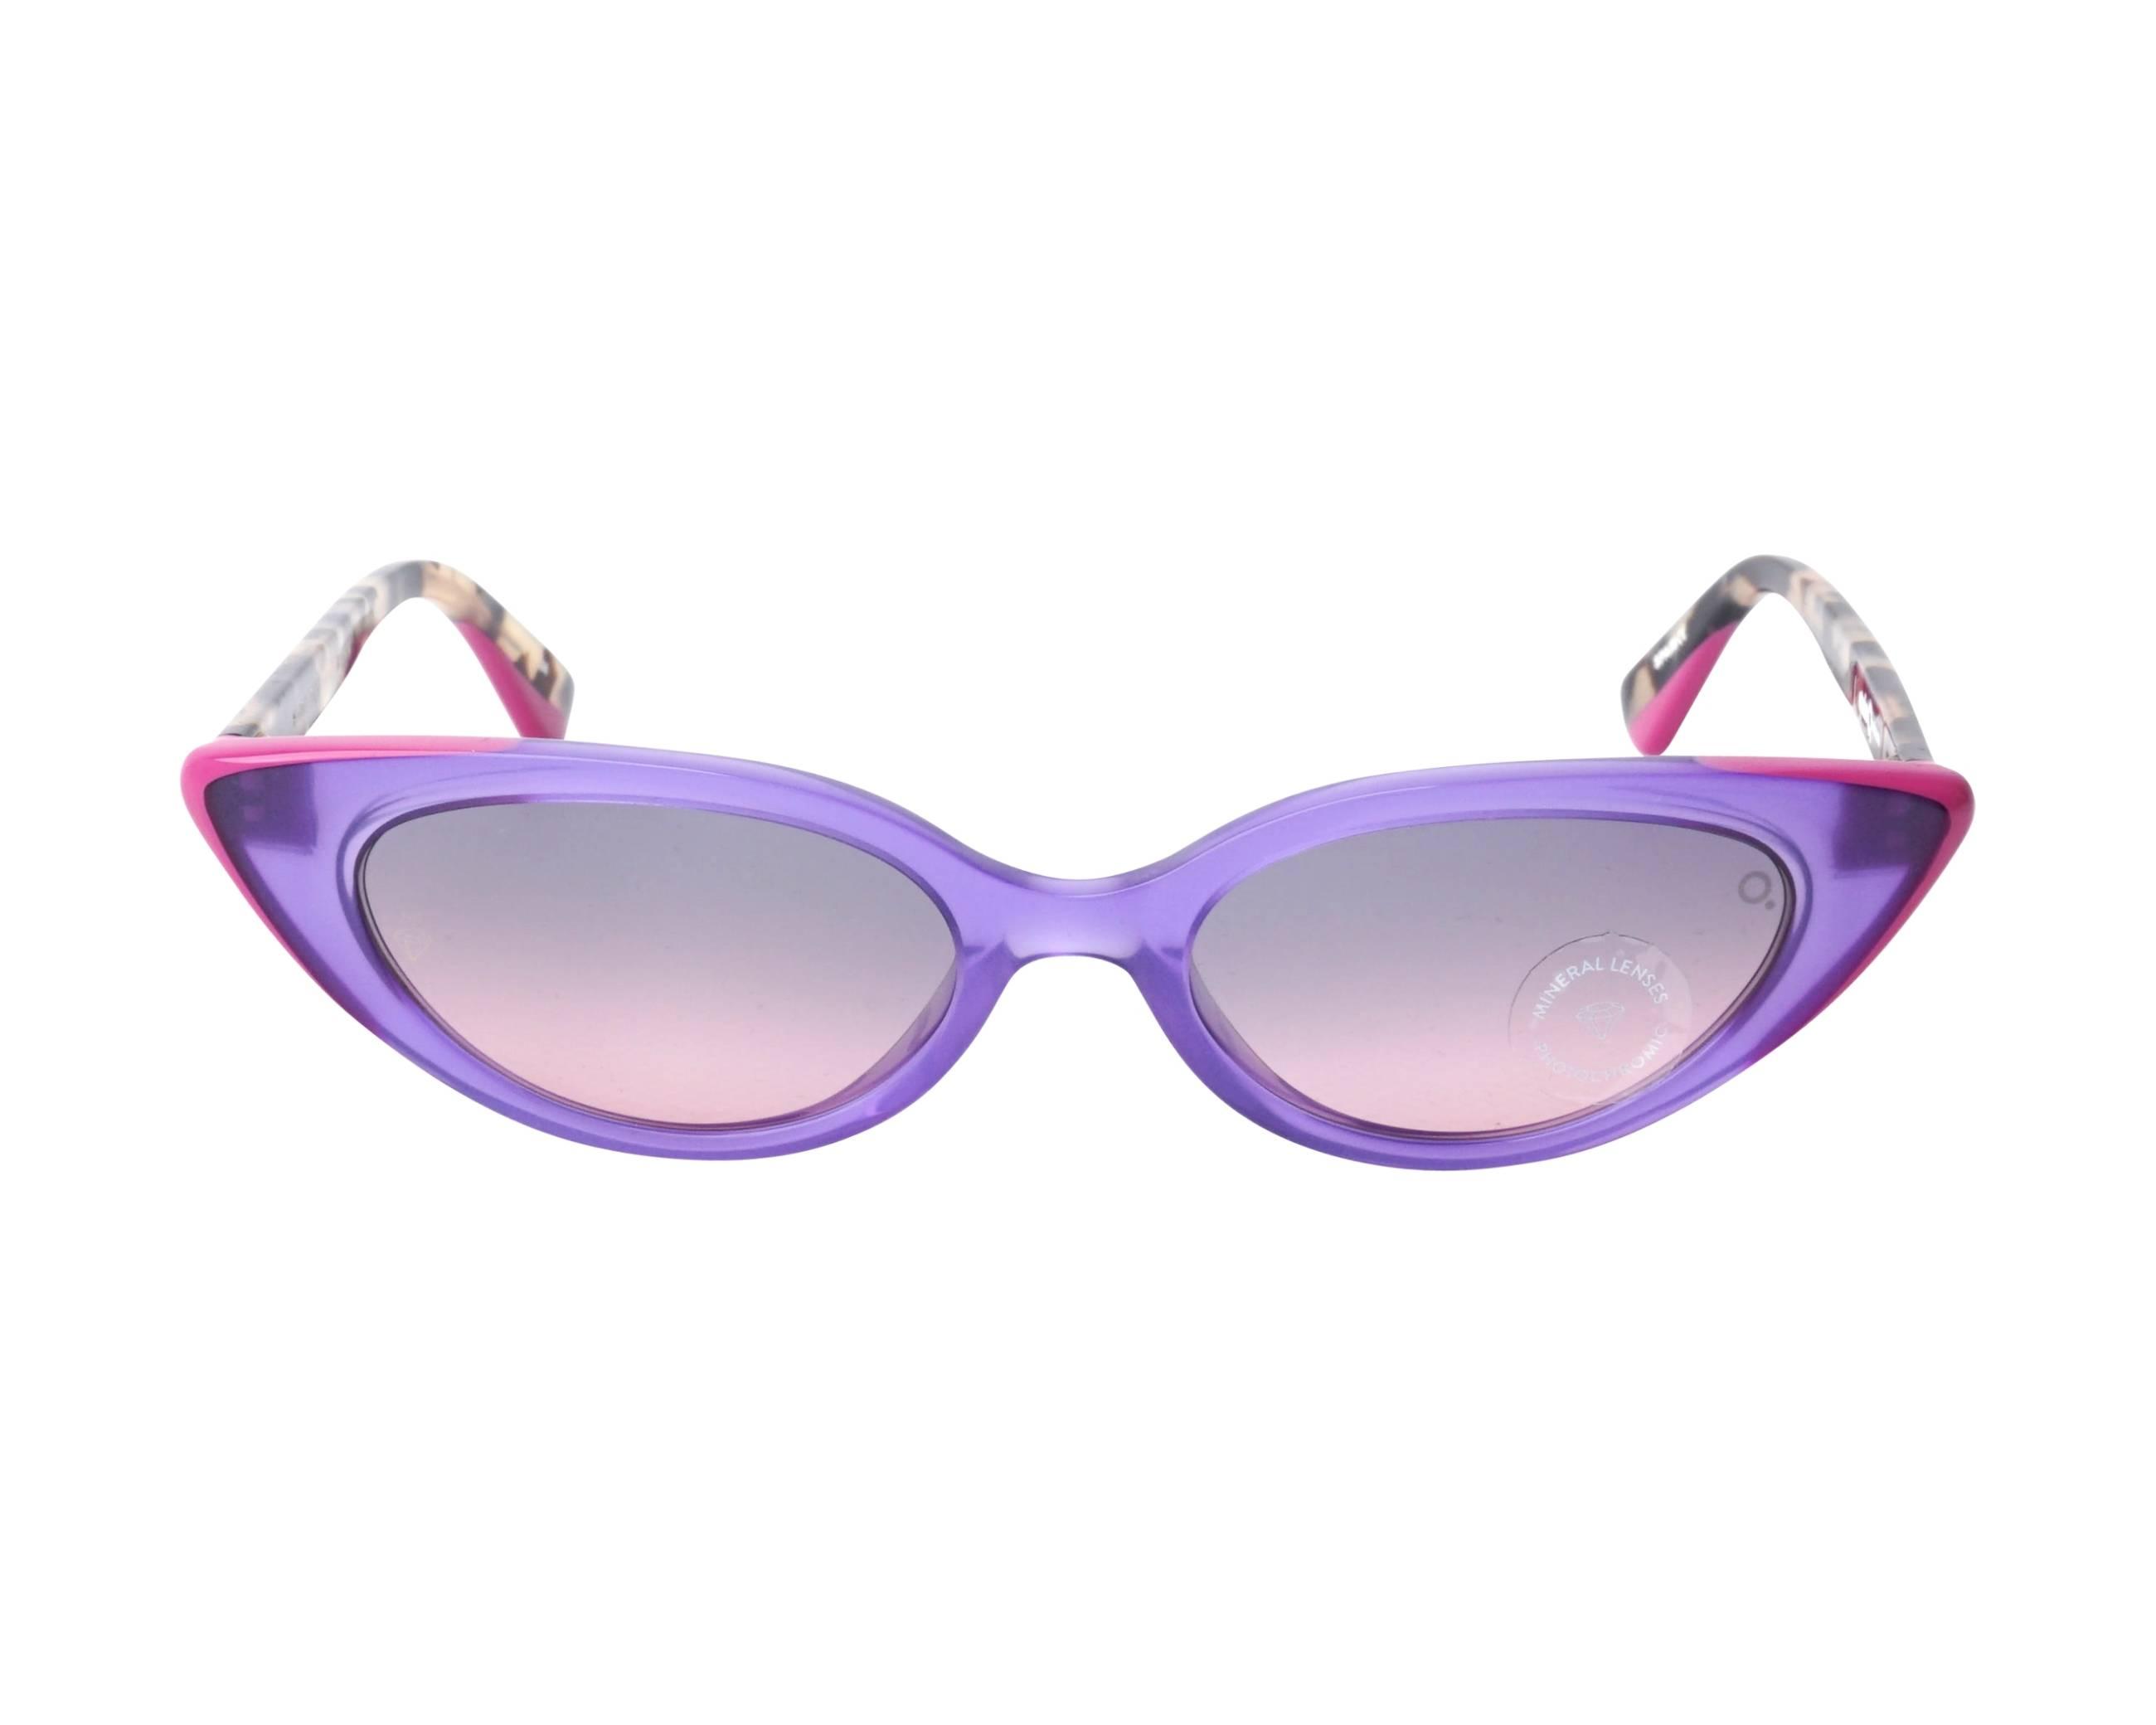 0ae9a7b551 Sunglasses Etnia Barcelona BANDAI PUHV 51-18 Violet Brown front view